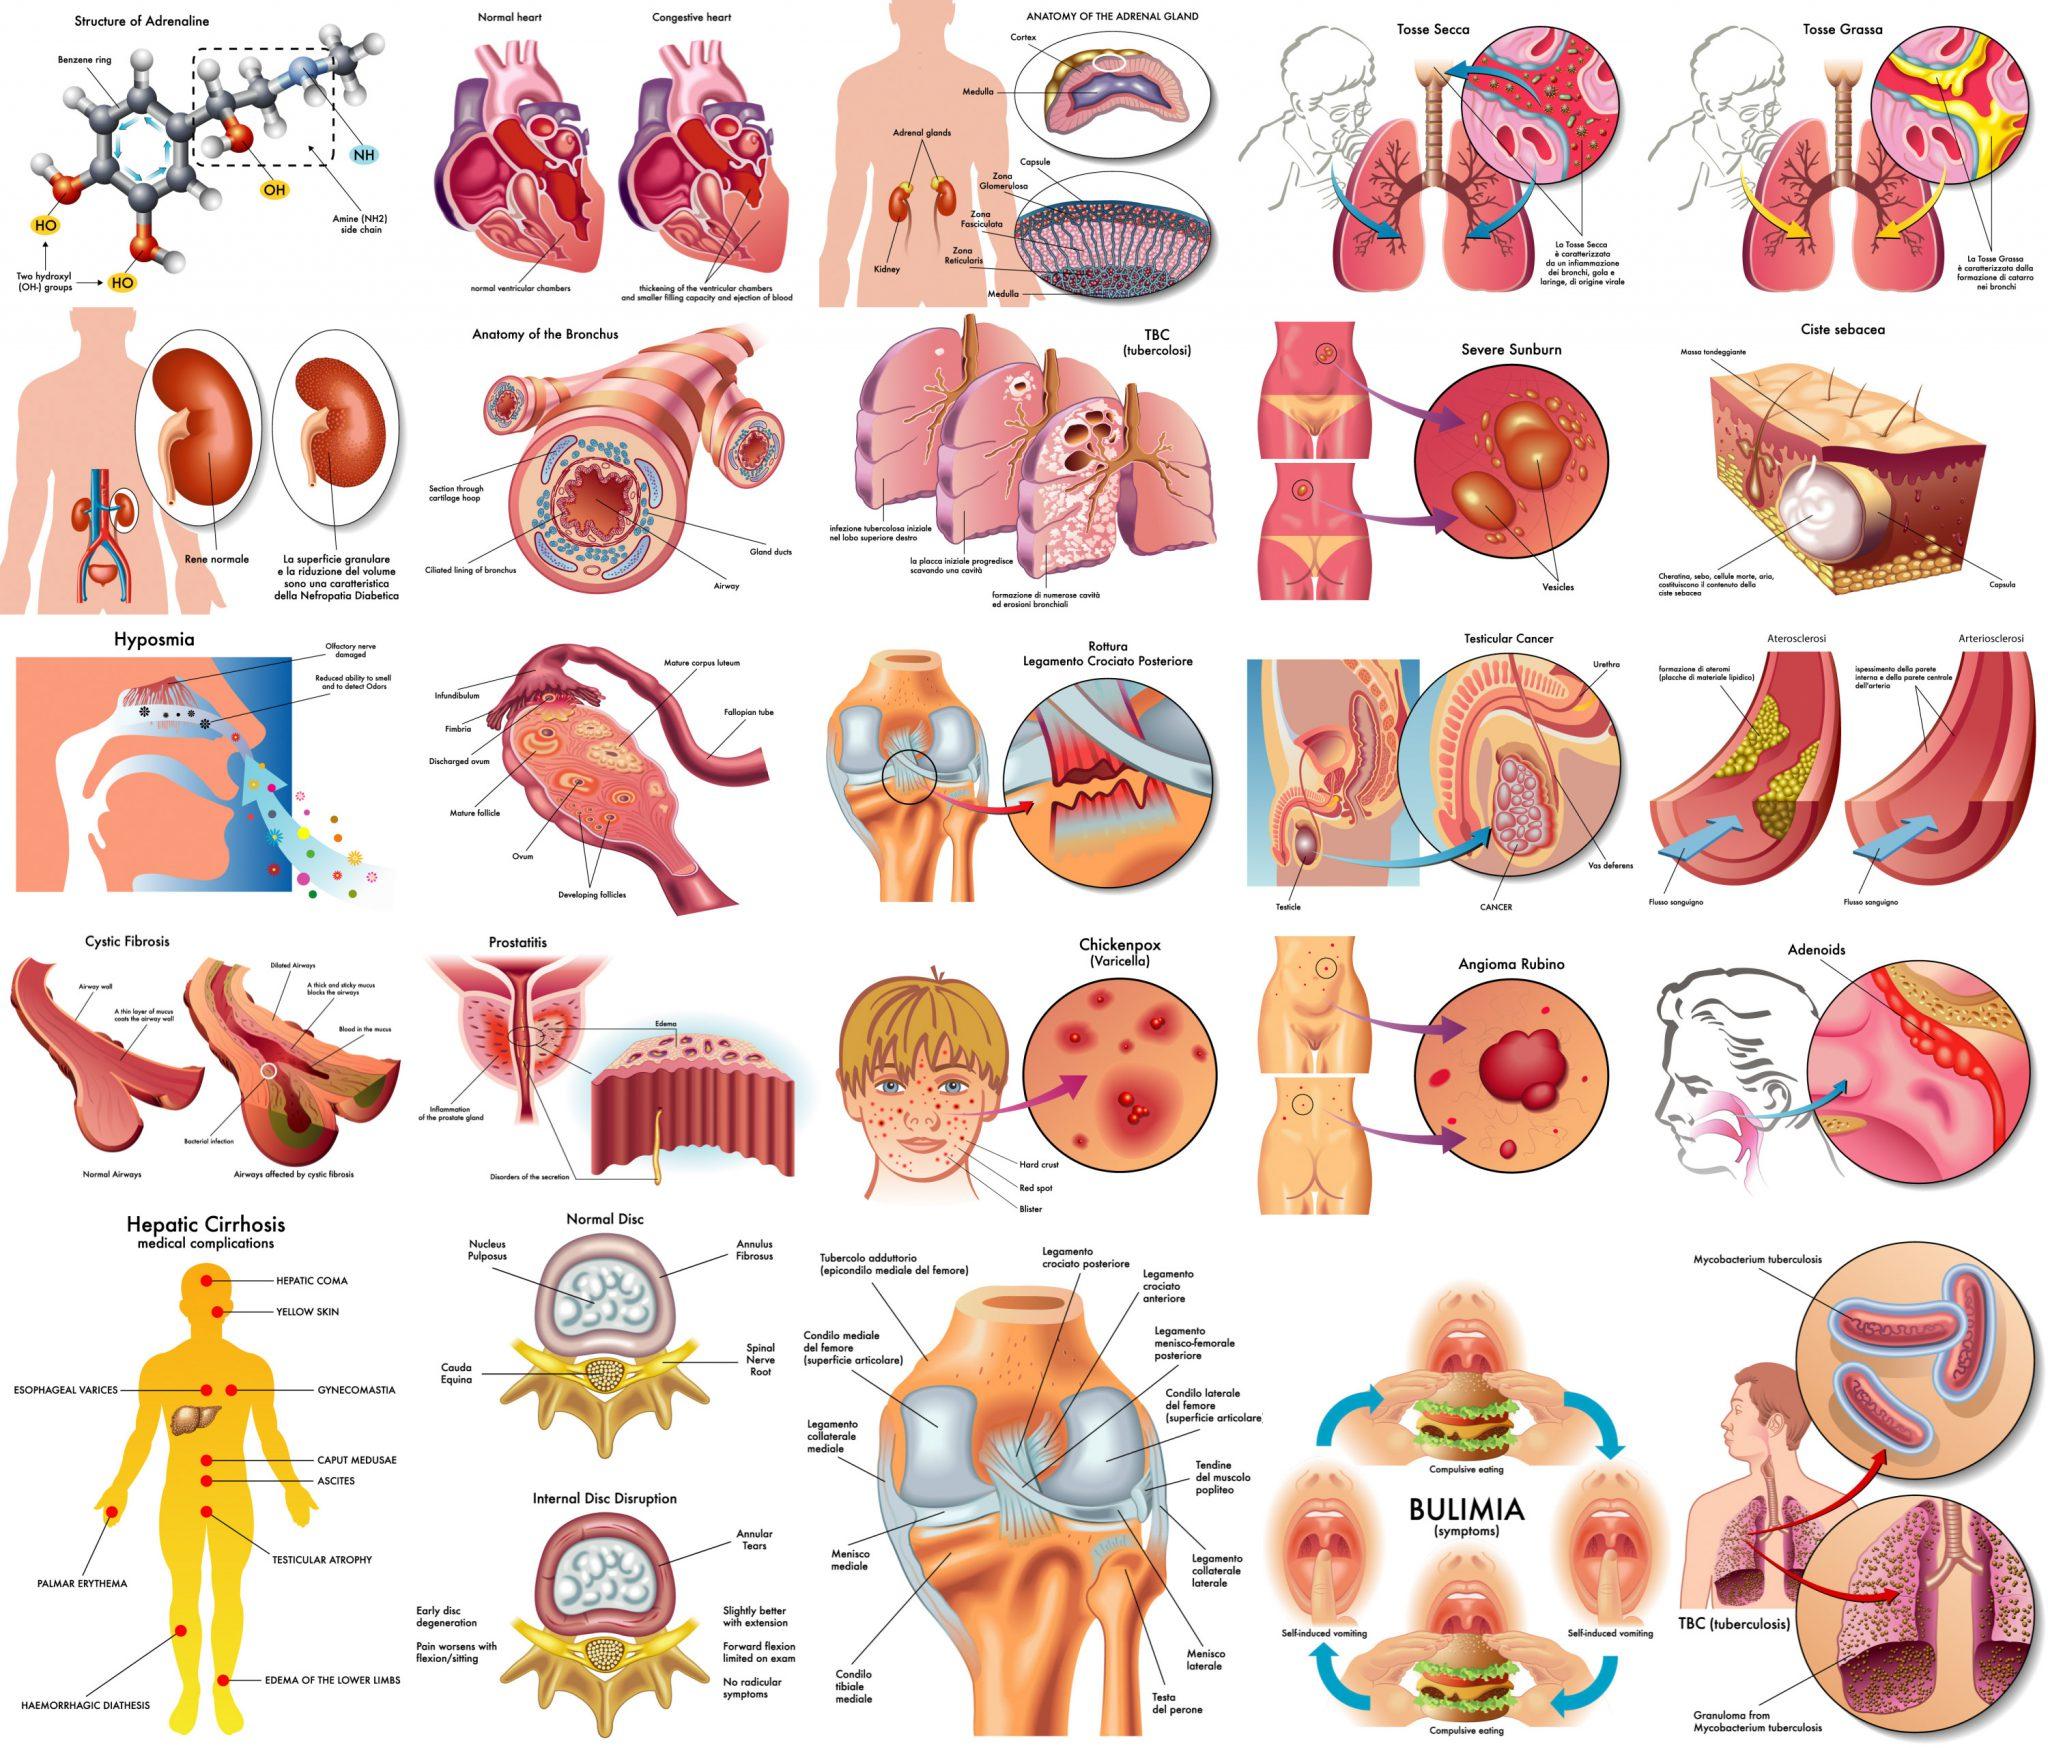 2048x1748 Illustrations Of Human Anatomy, Disease, Medical Topics Vector